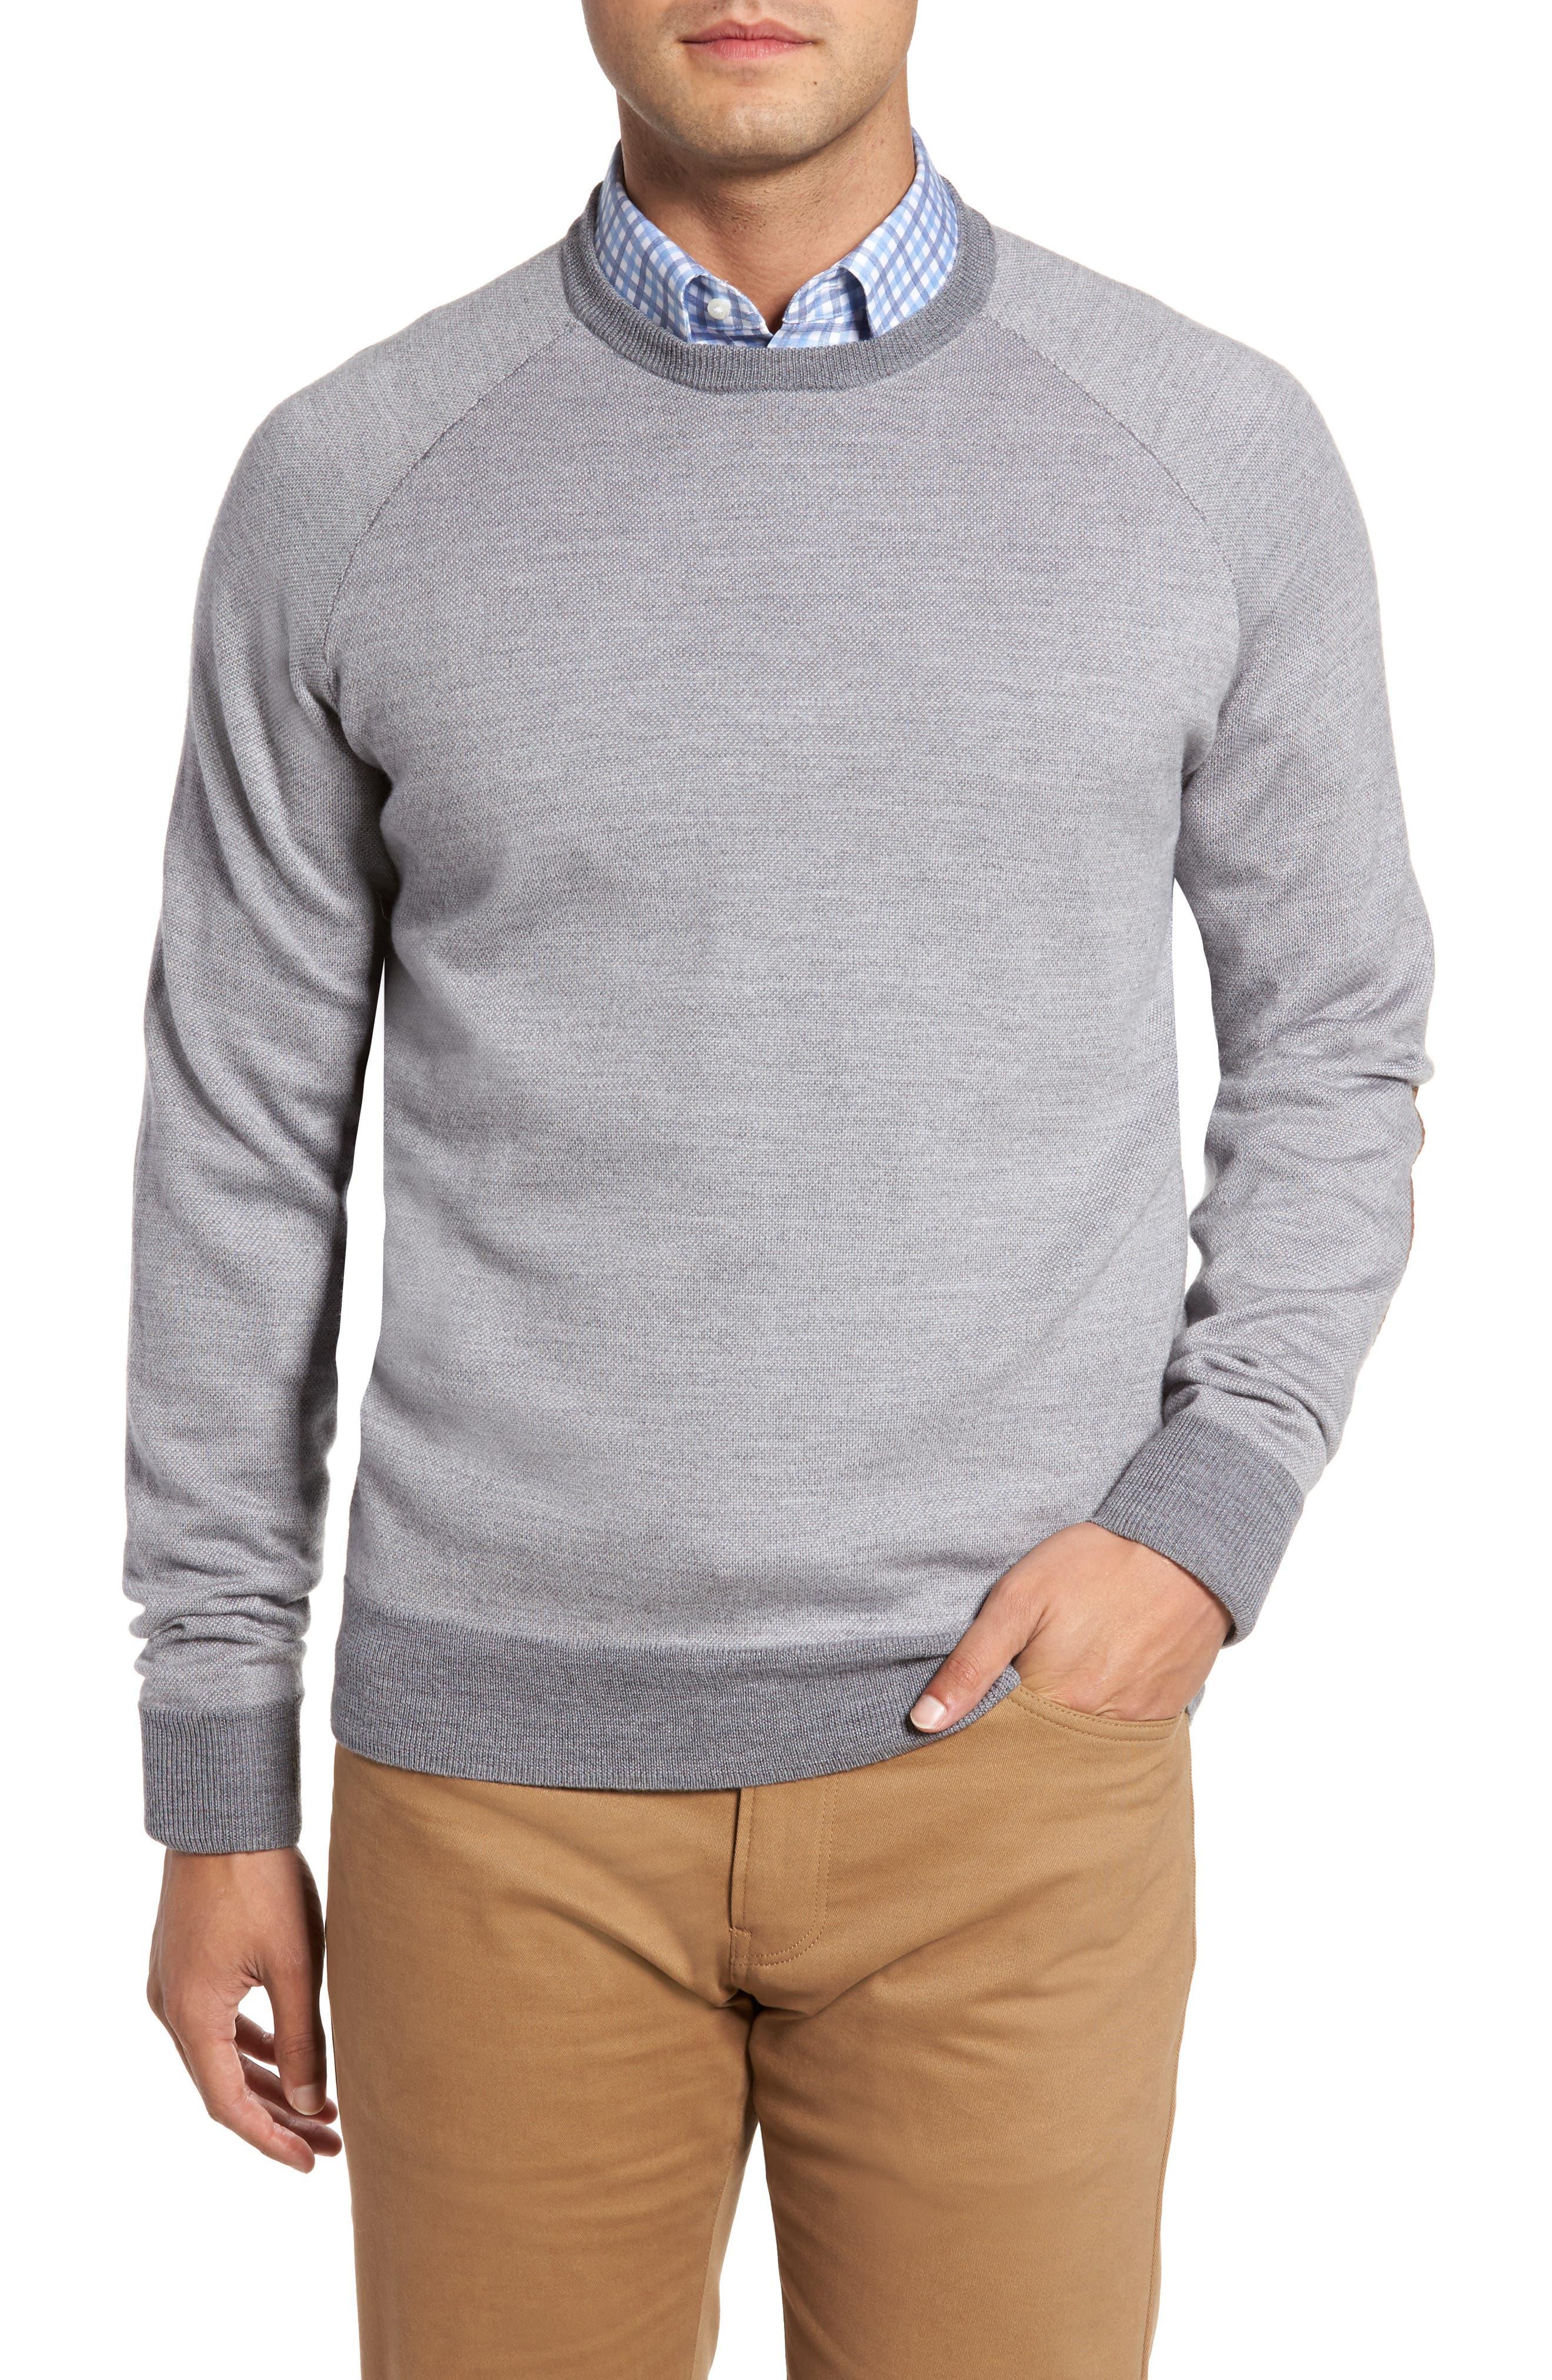 Soltice Merino Sweater,                             Main thumbnail 1, color,                             029